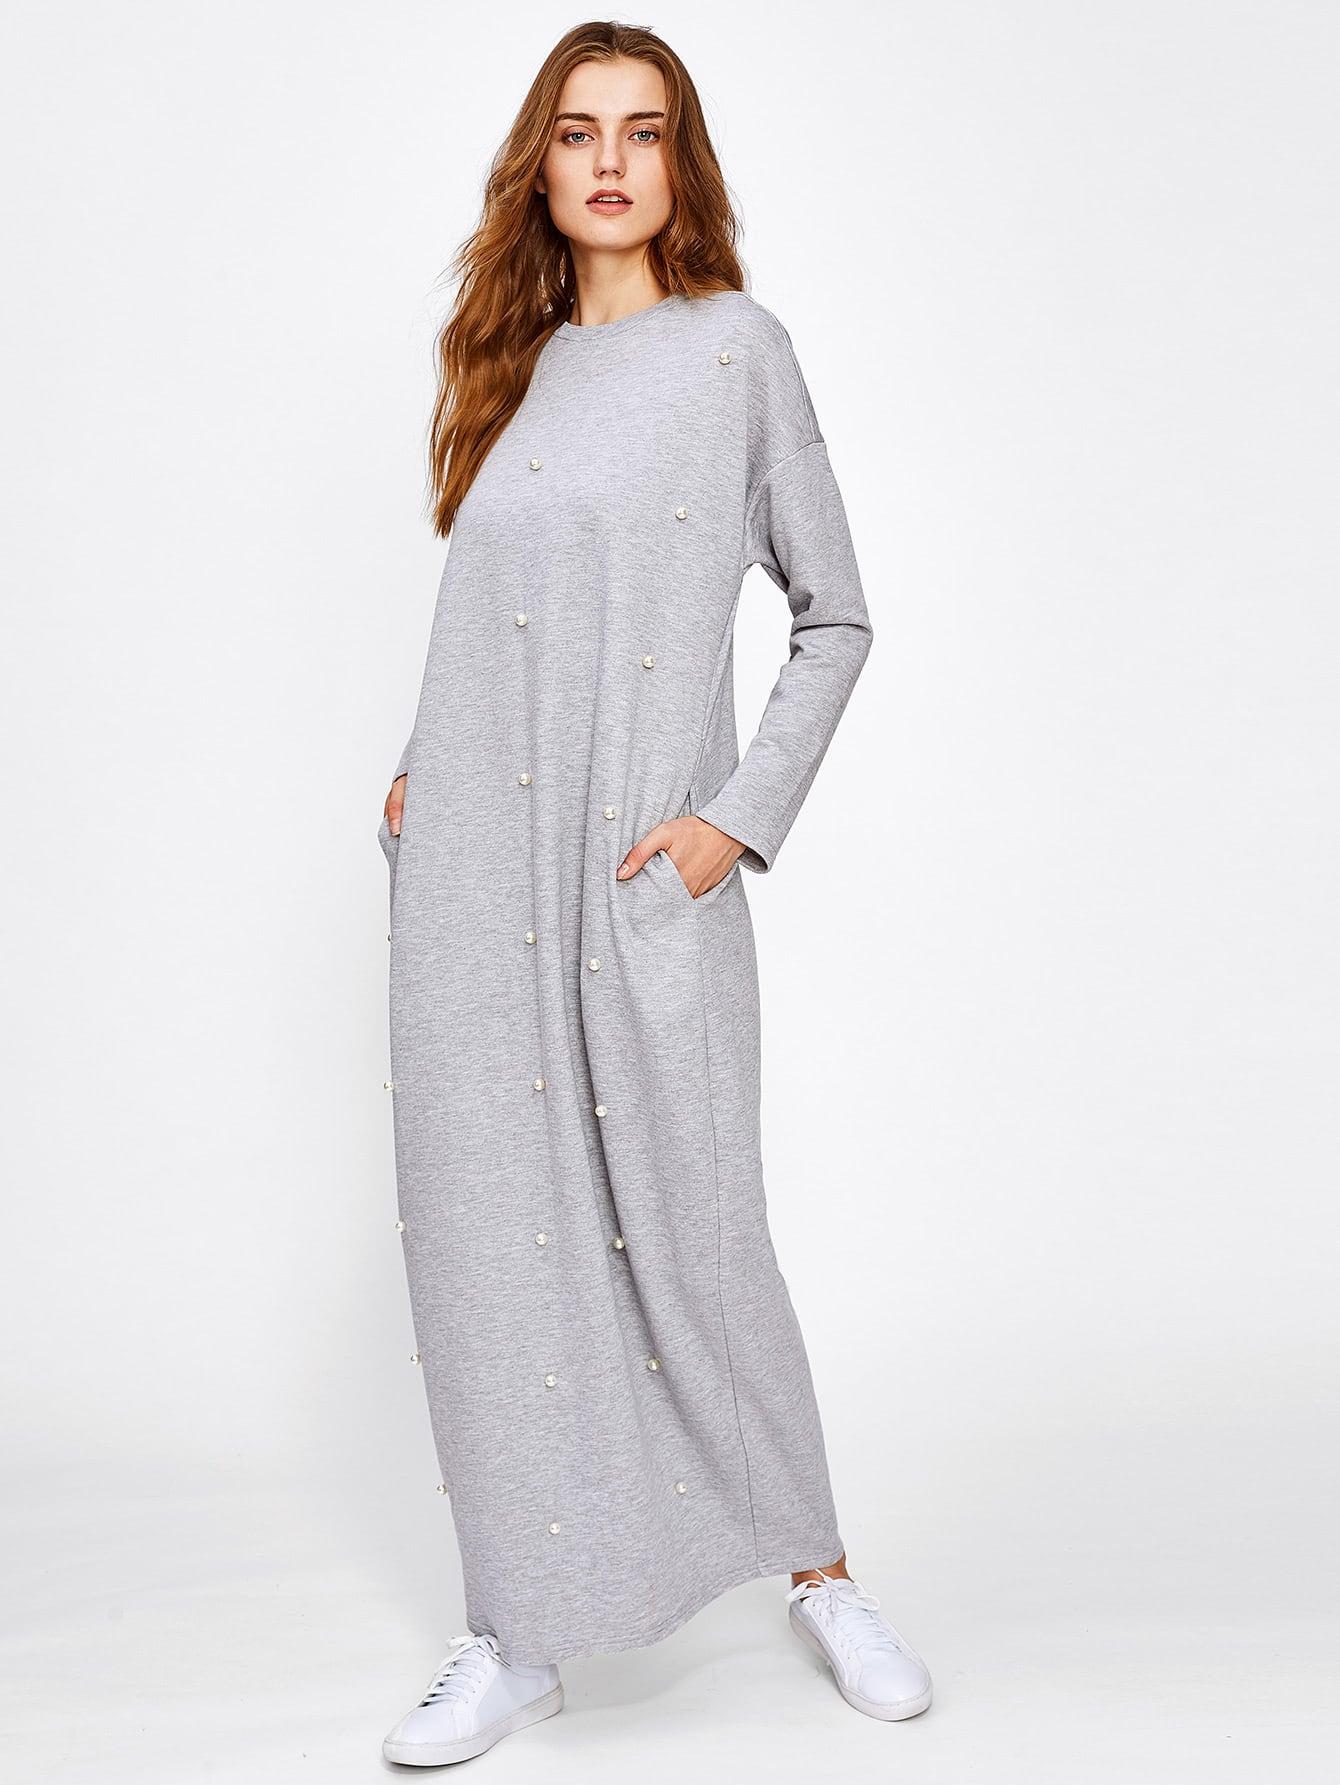 Pearl Beading Heather Knit Hijab Long Dress heather knit swing dress